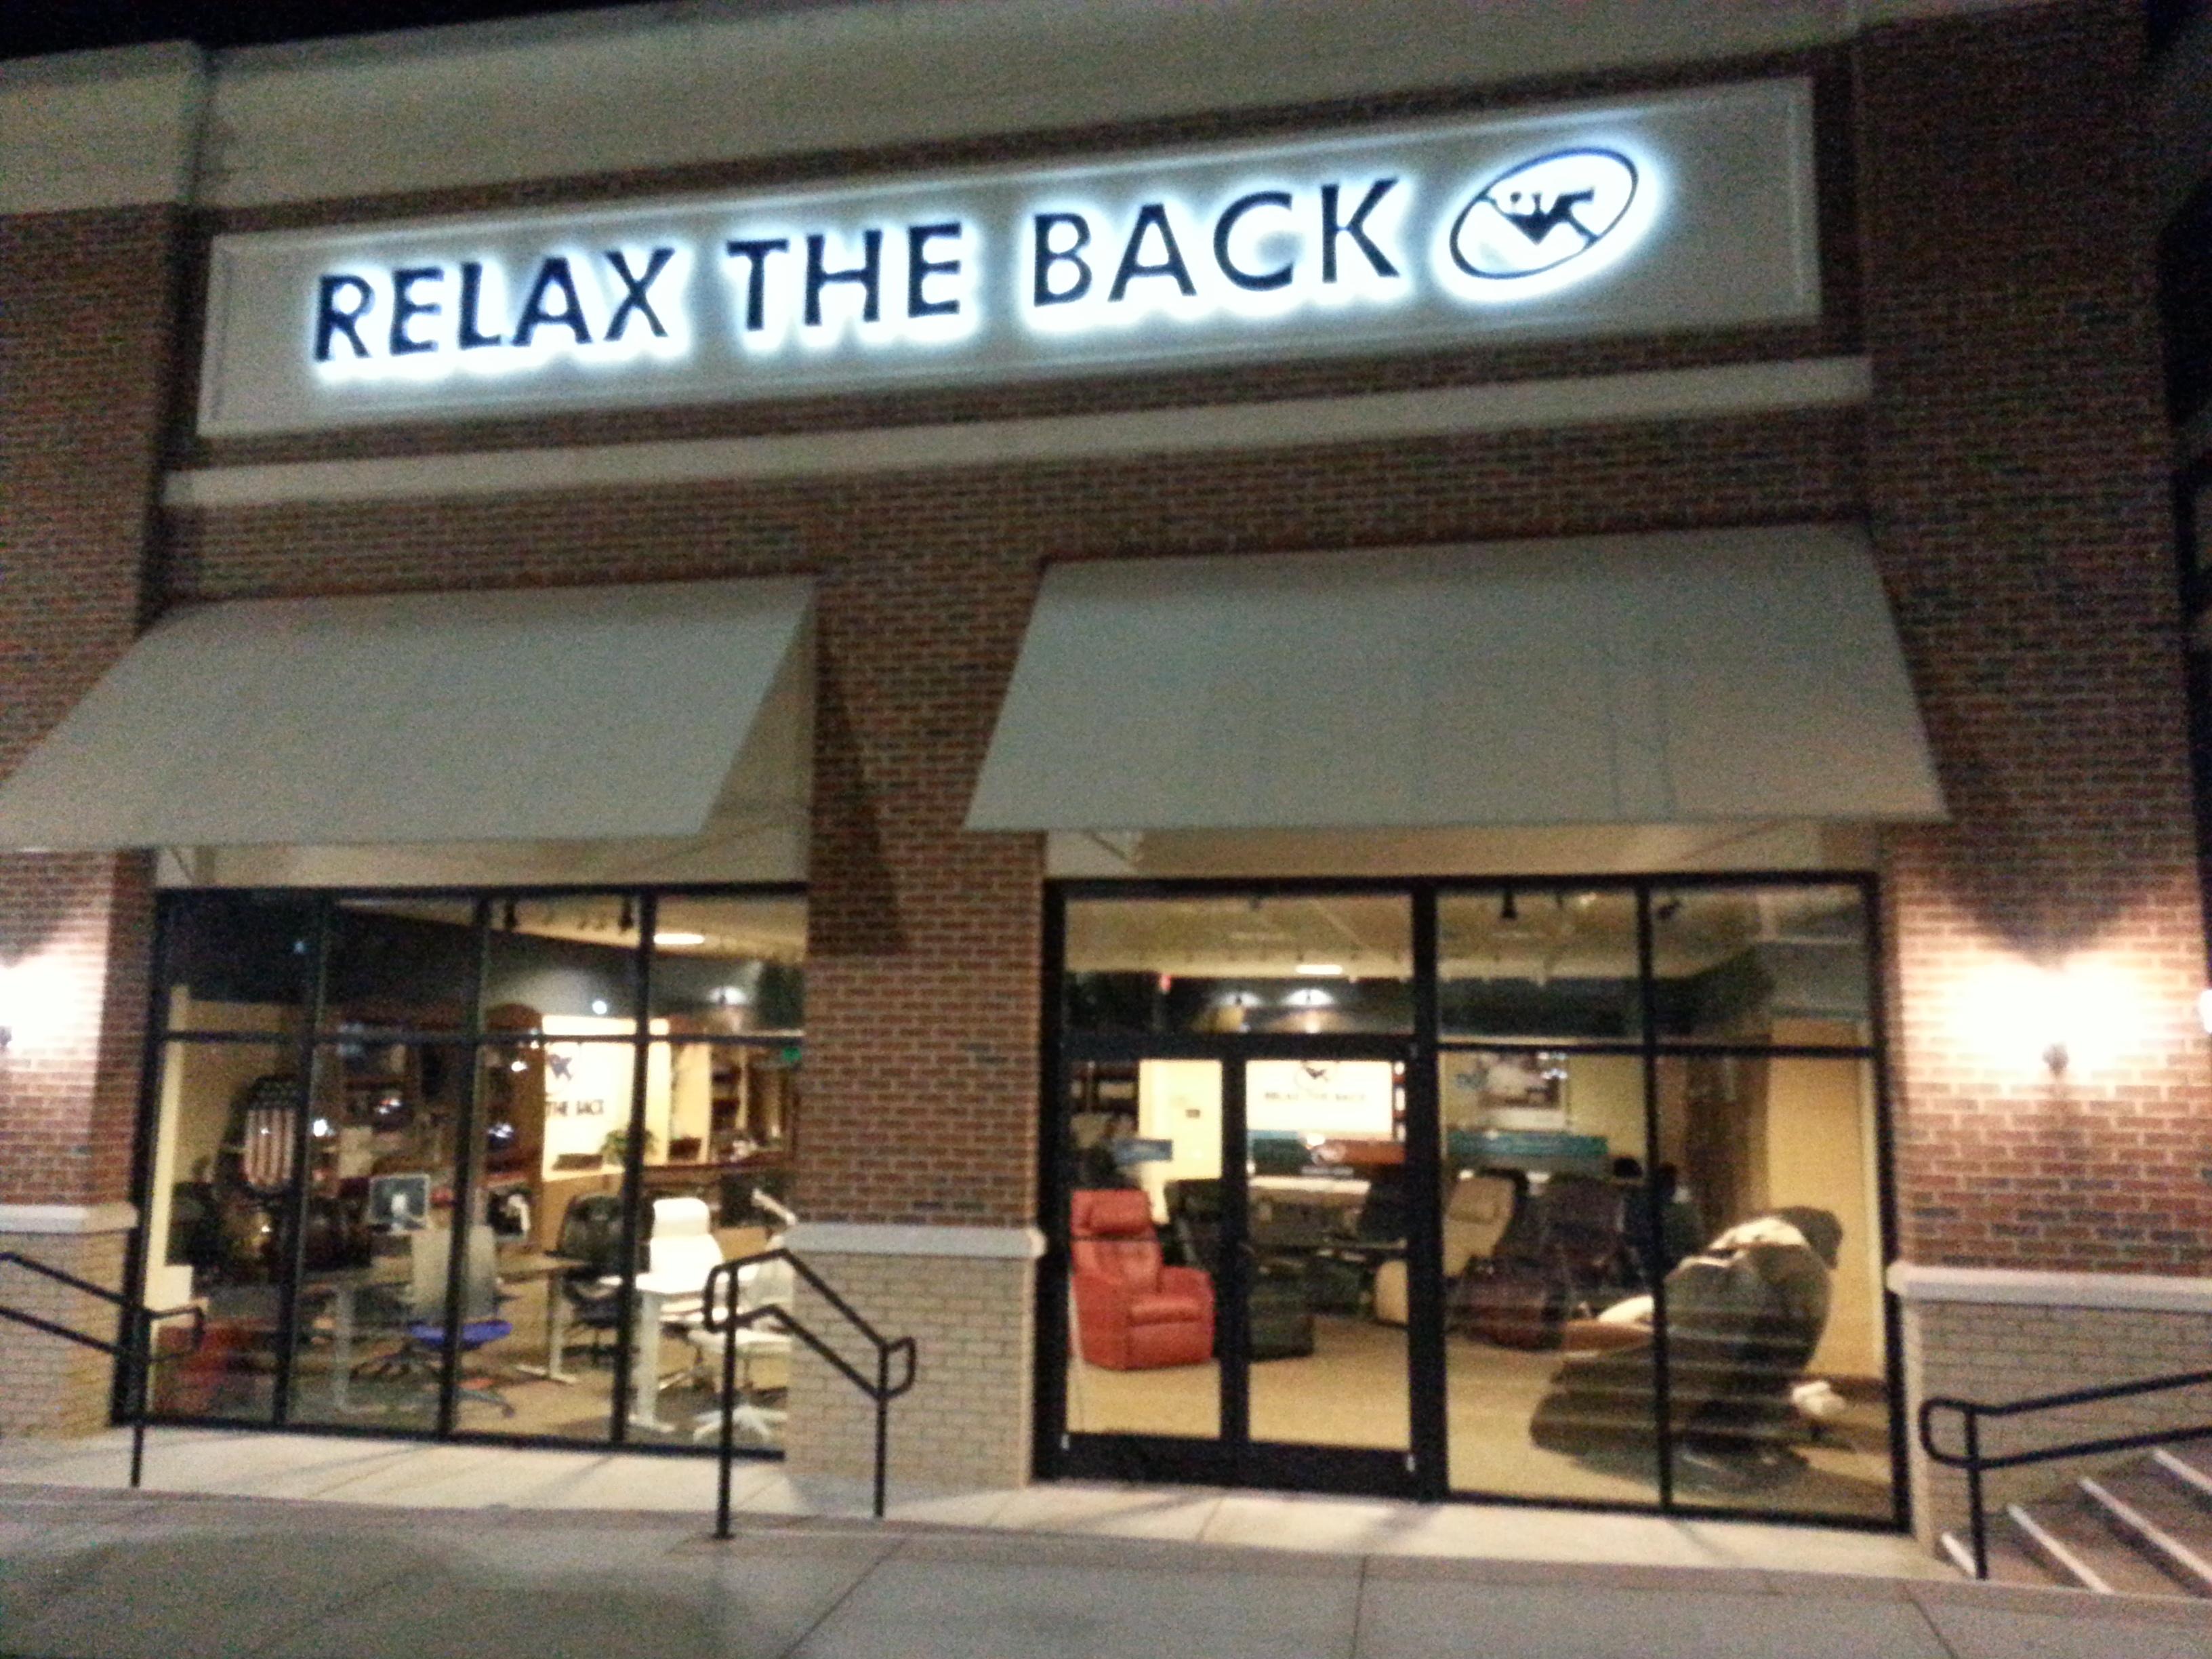 Relax The Back Office Chair Reviews: Atlanta, GA 30346